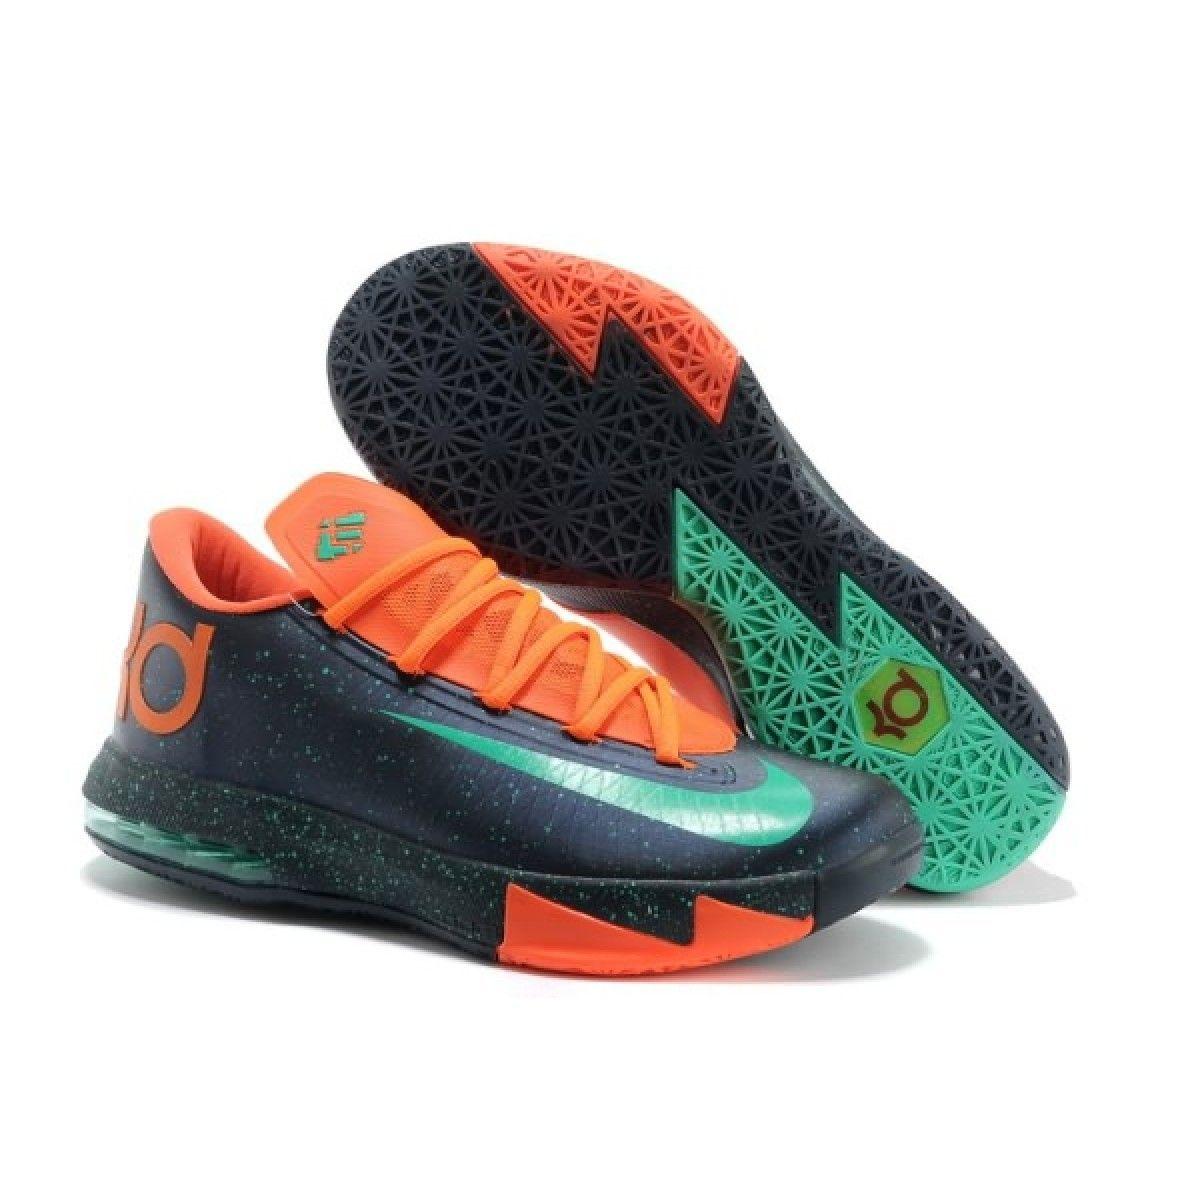 Nike kd shoes, Kd shoes, Nike shoes cheap